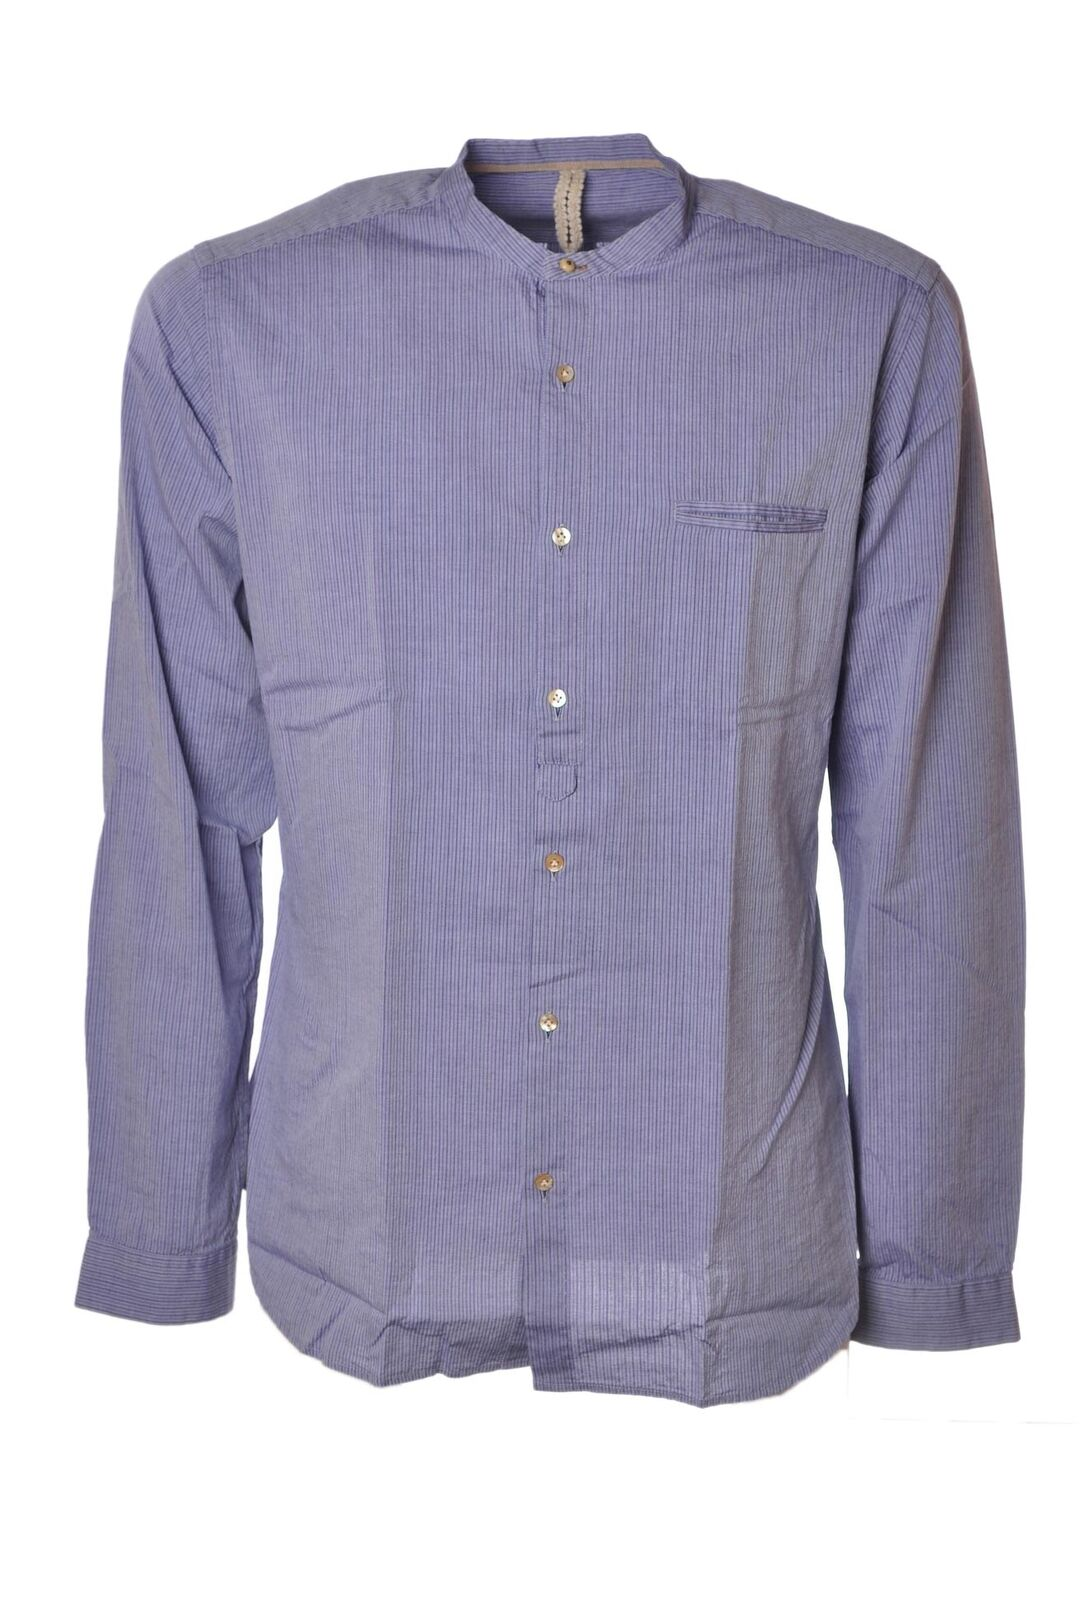 Dnl - Shirts-Shirts - Man - bluee - 4356906G185116